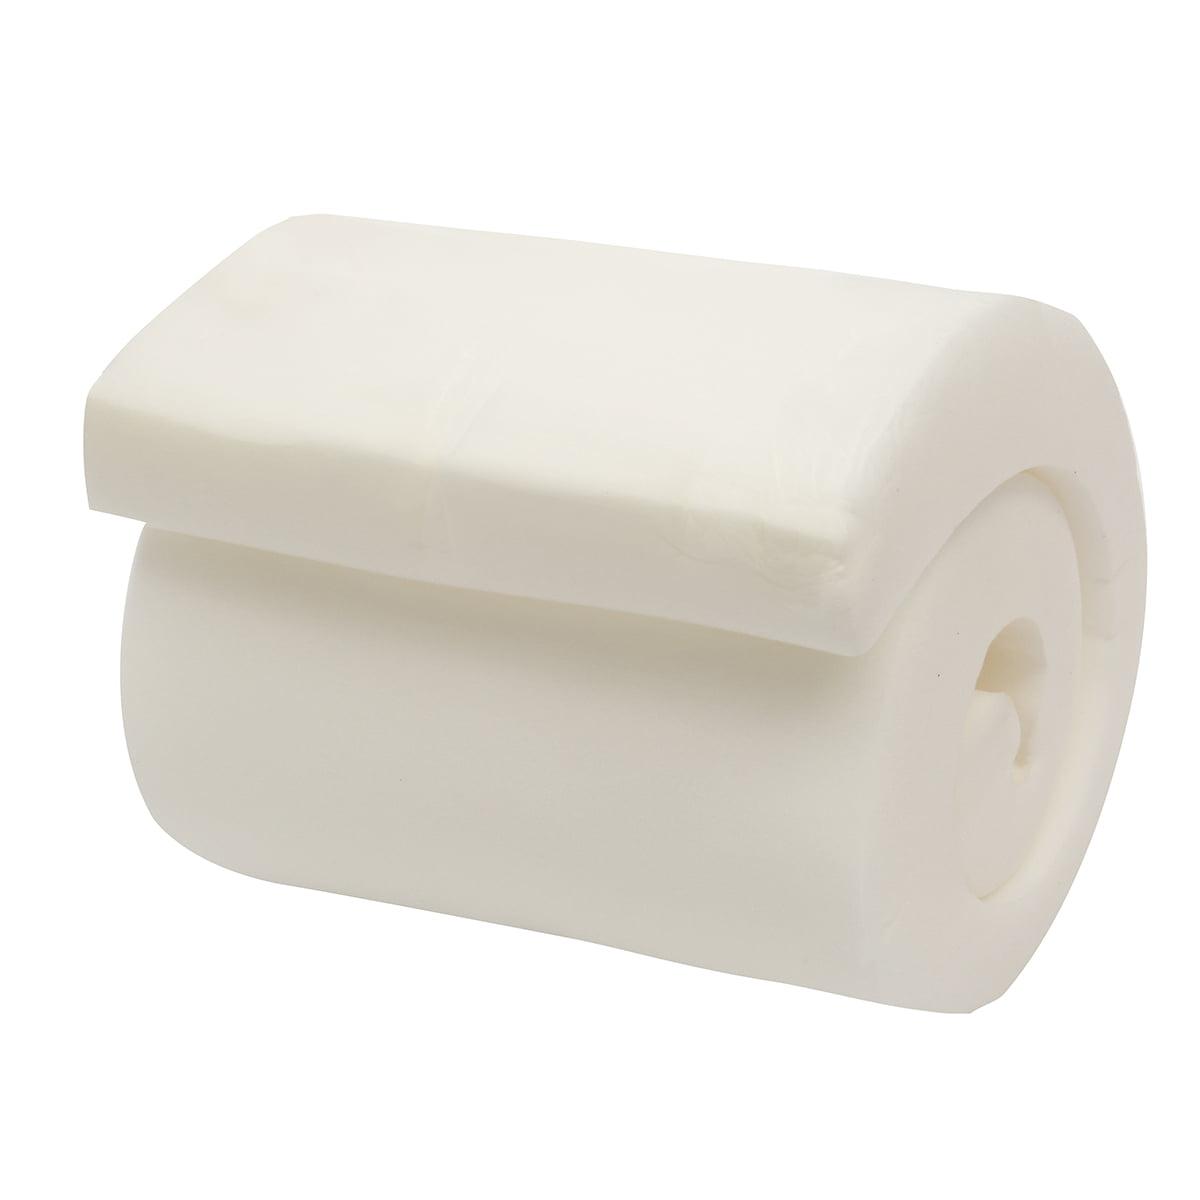 Seat Foam Upholstery Cushion